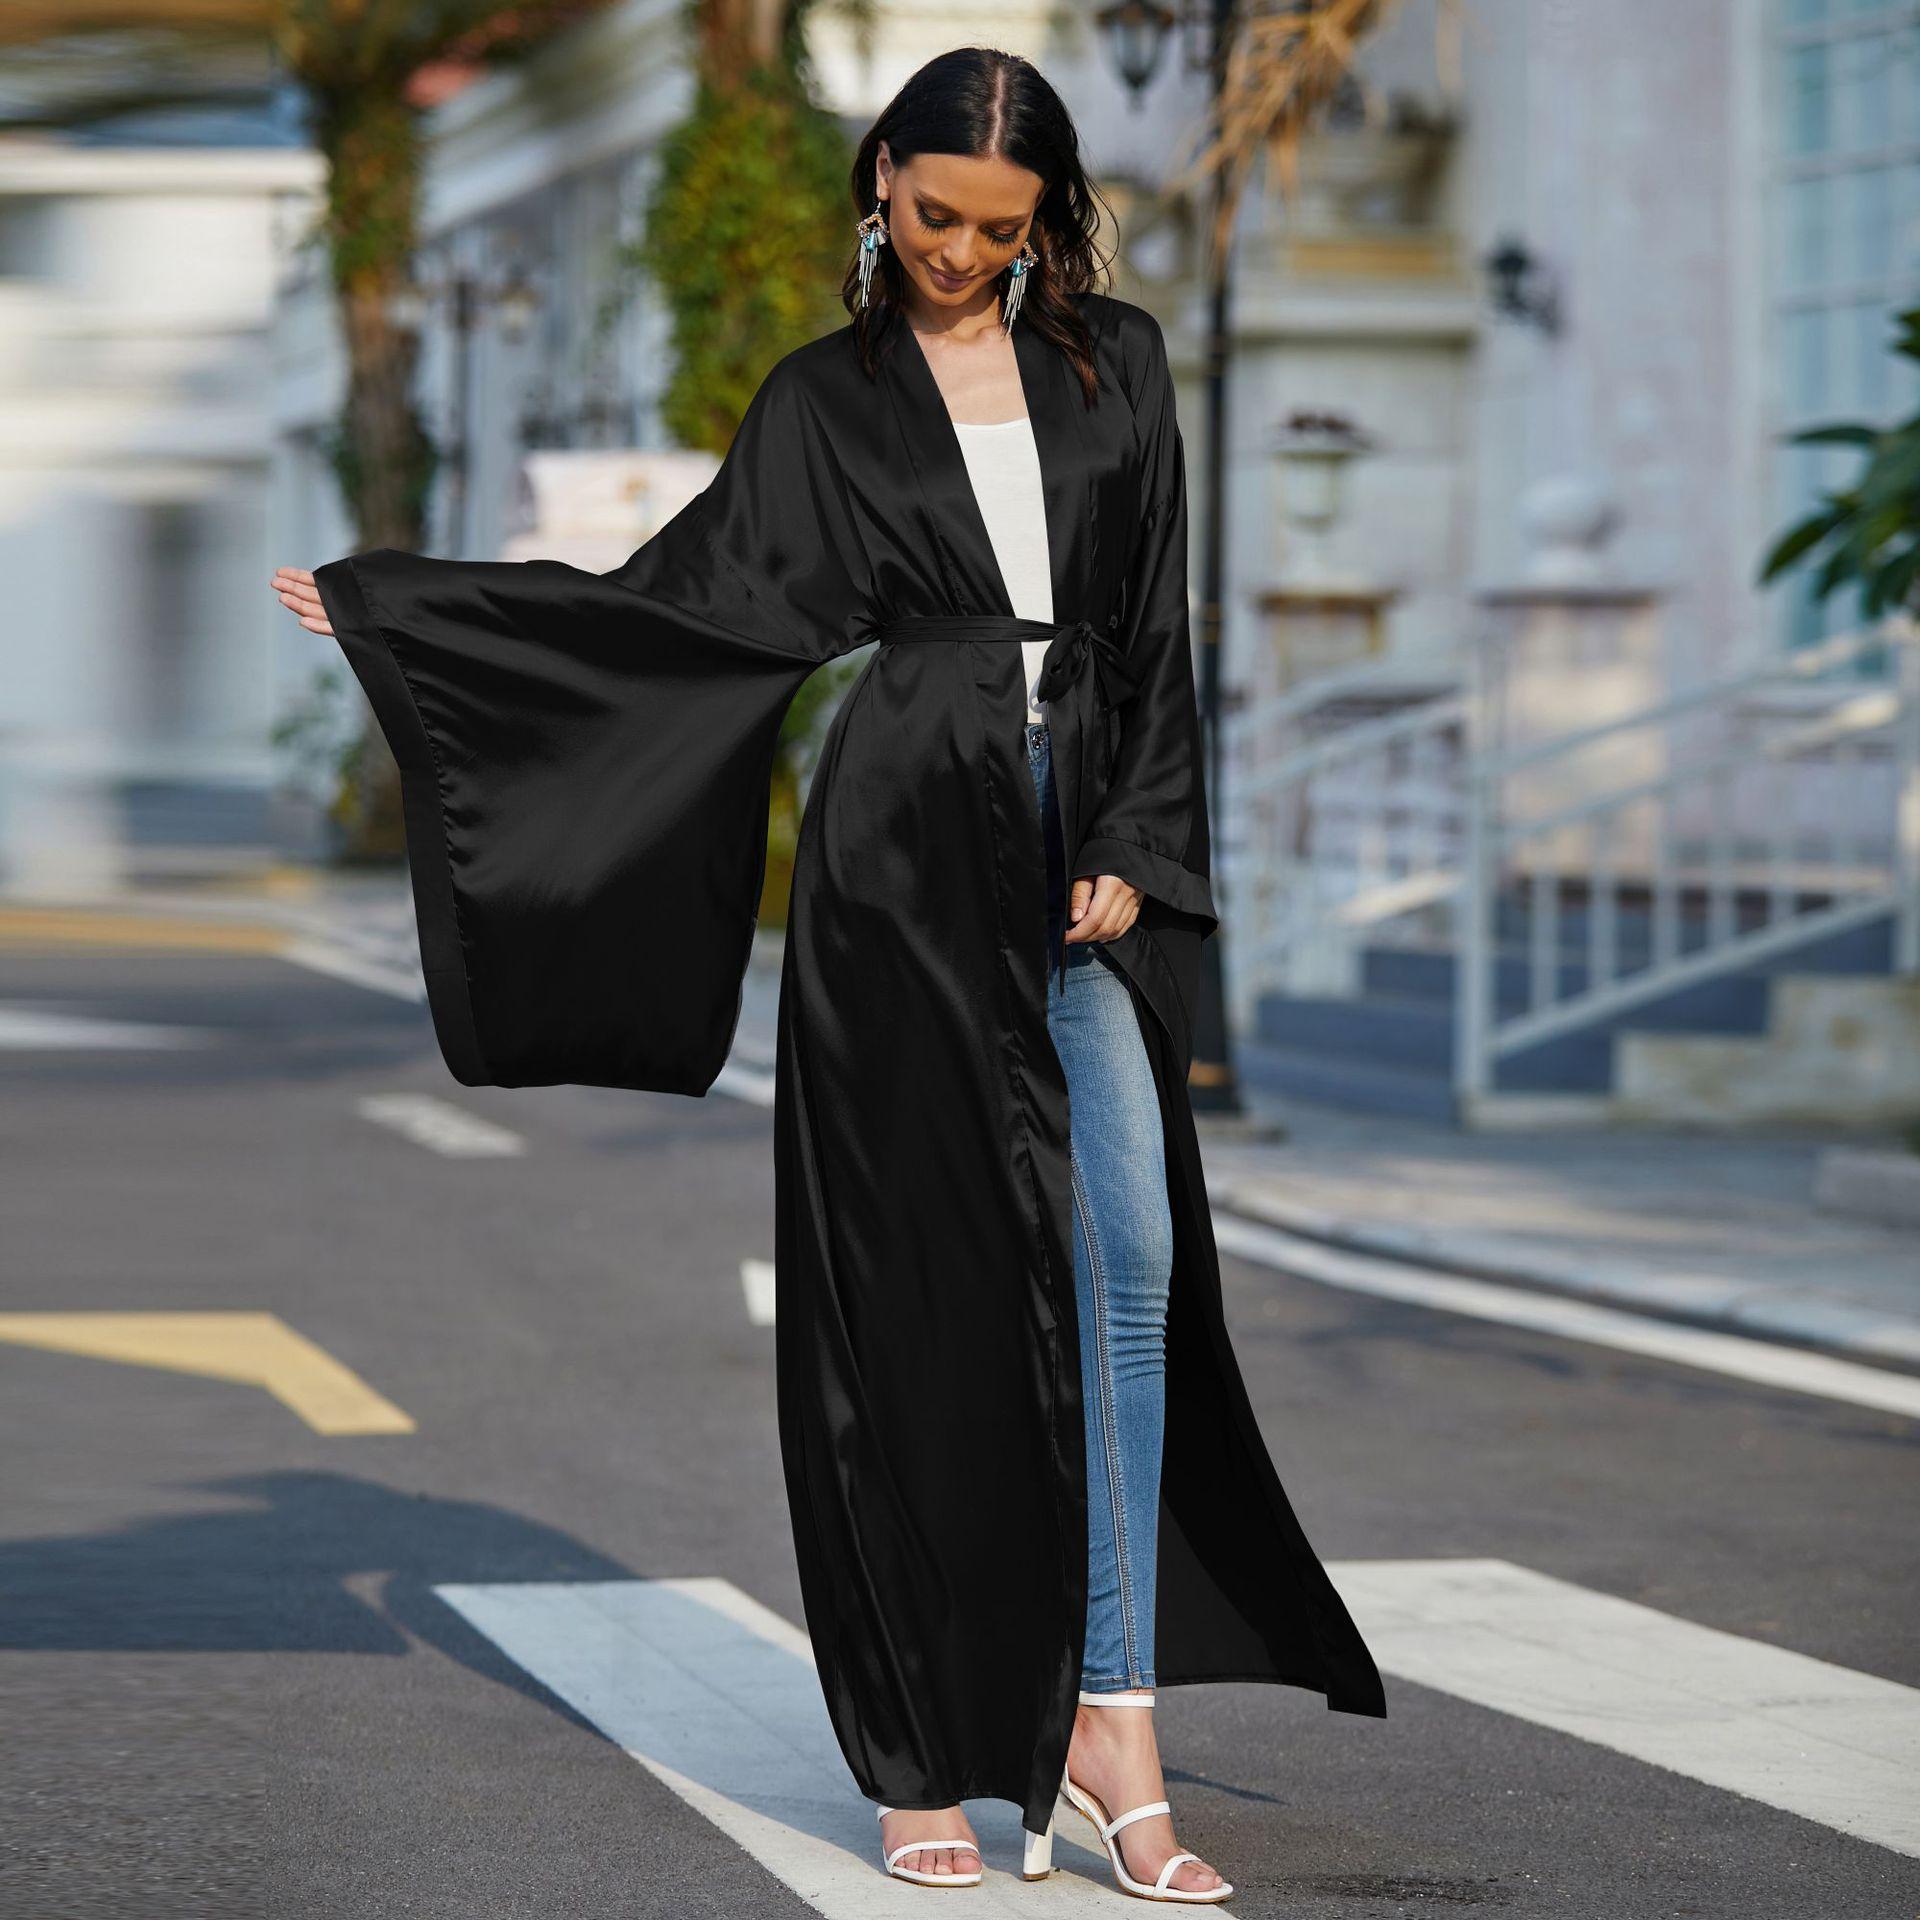 Eid Mubarak Open Abaya Kimono Muslim Hijab Dress Turkey Satin Abayas for Women Dubai Long Dresses Islam Clothing Moroccan Kaftan